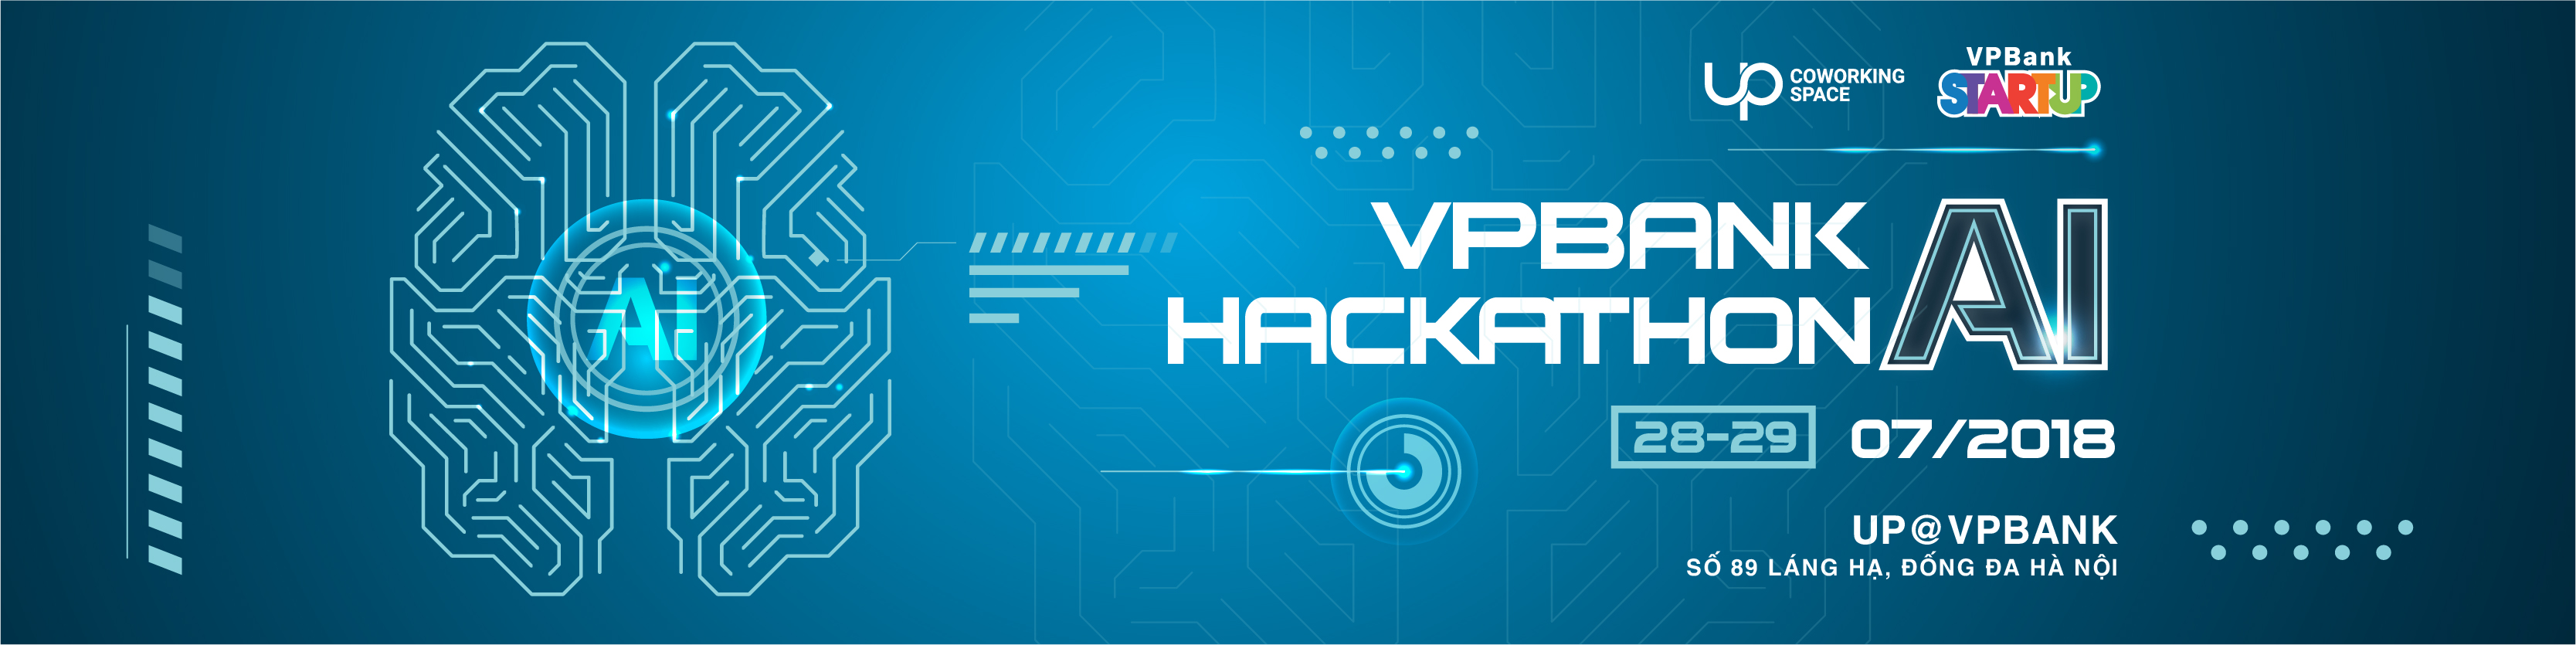 VPBank Hackathon AI 2018